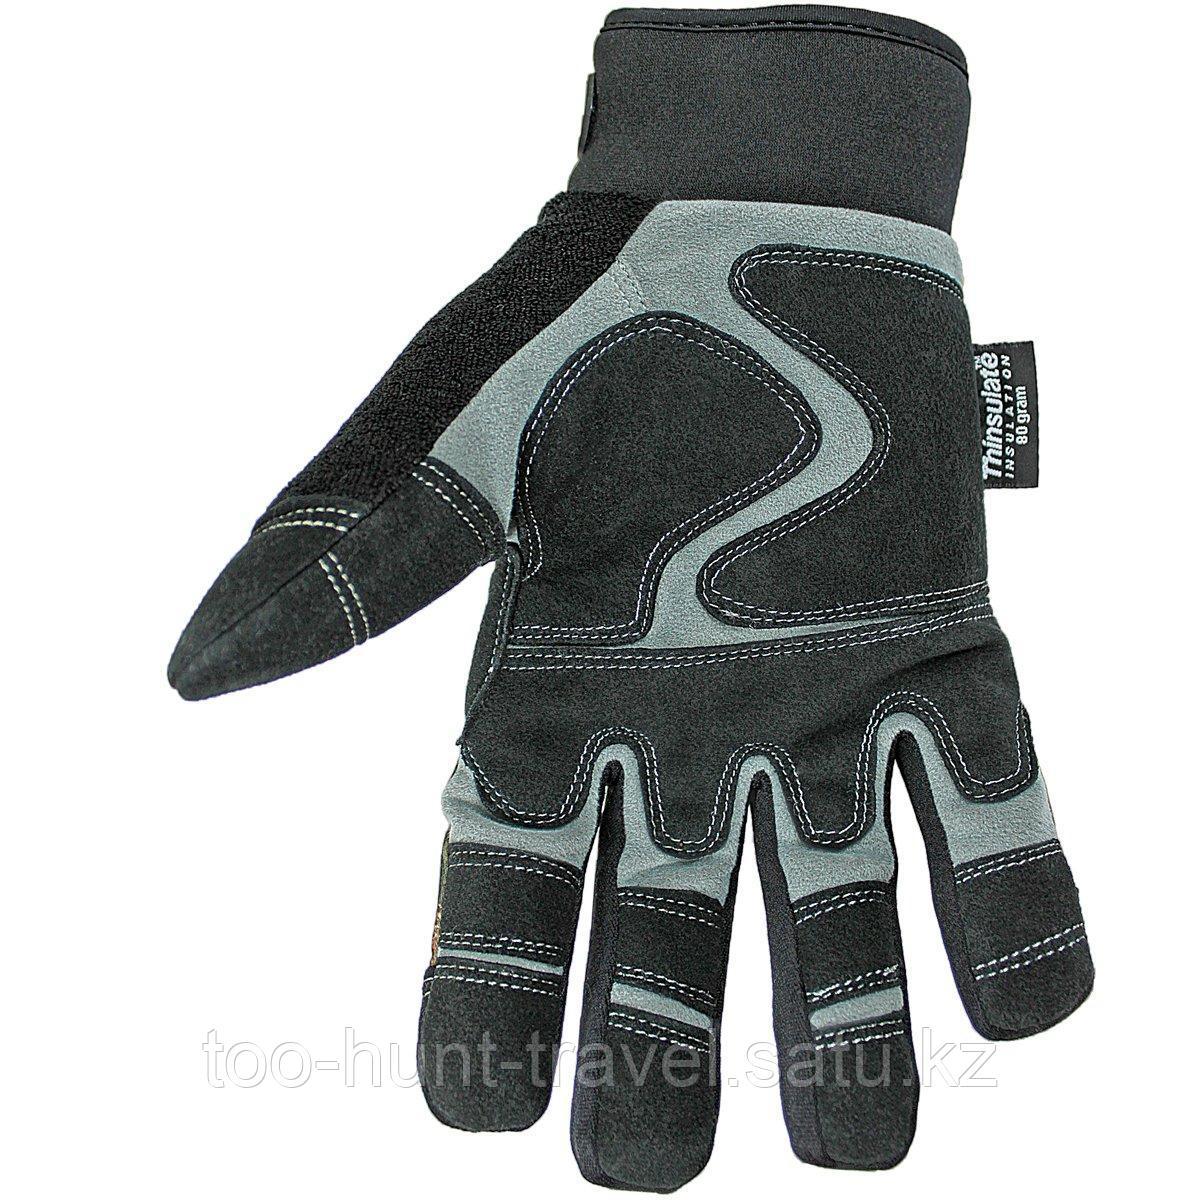 Зимние перчатки для охоты Youngstown Glove Company - фото 4